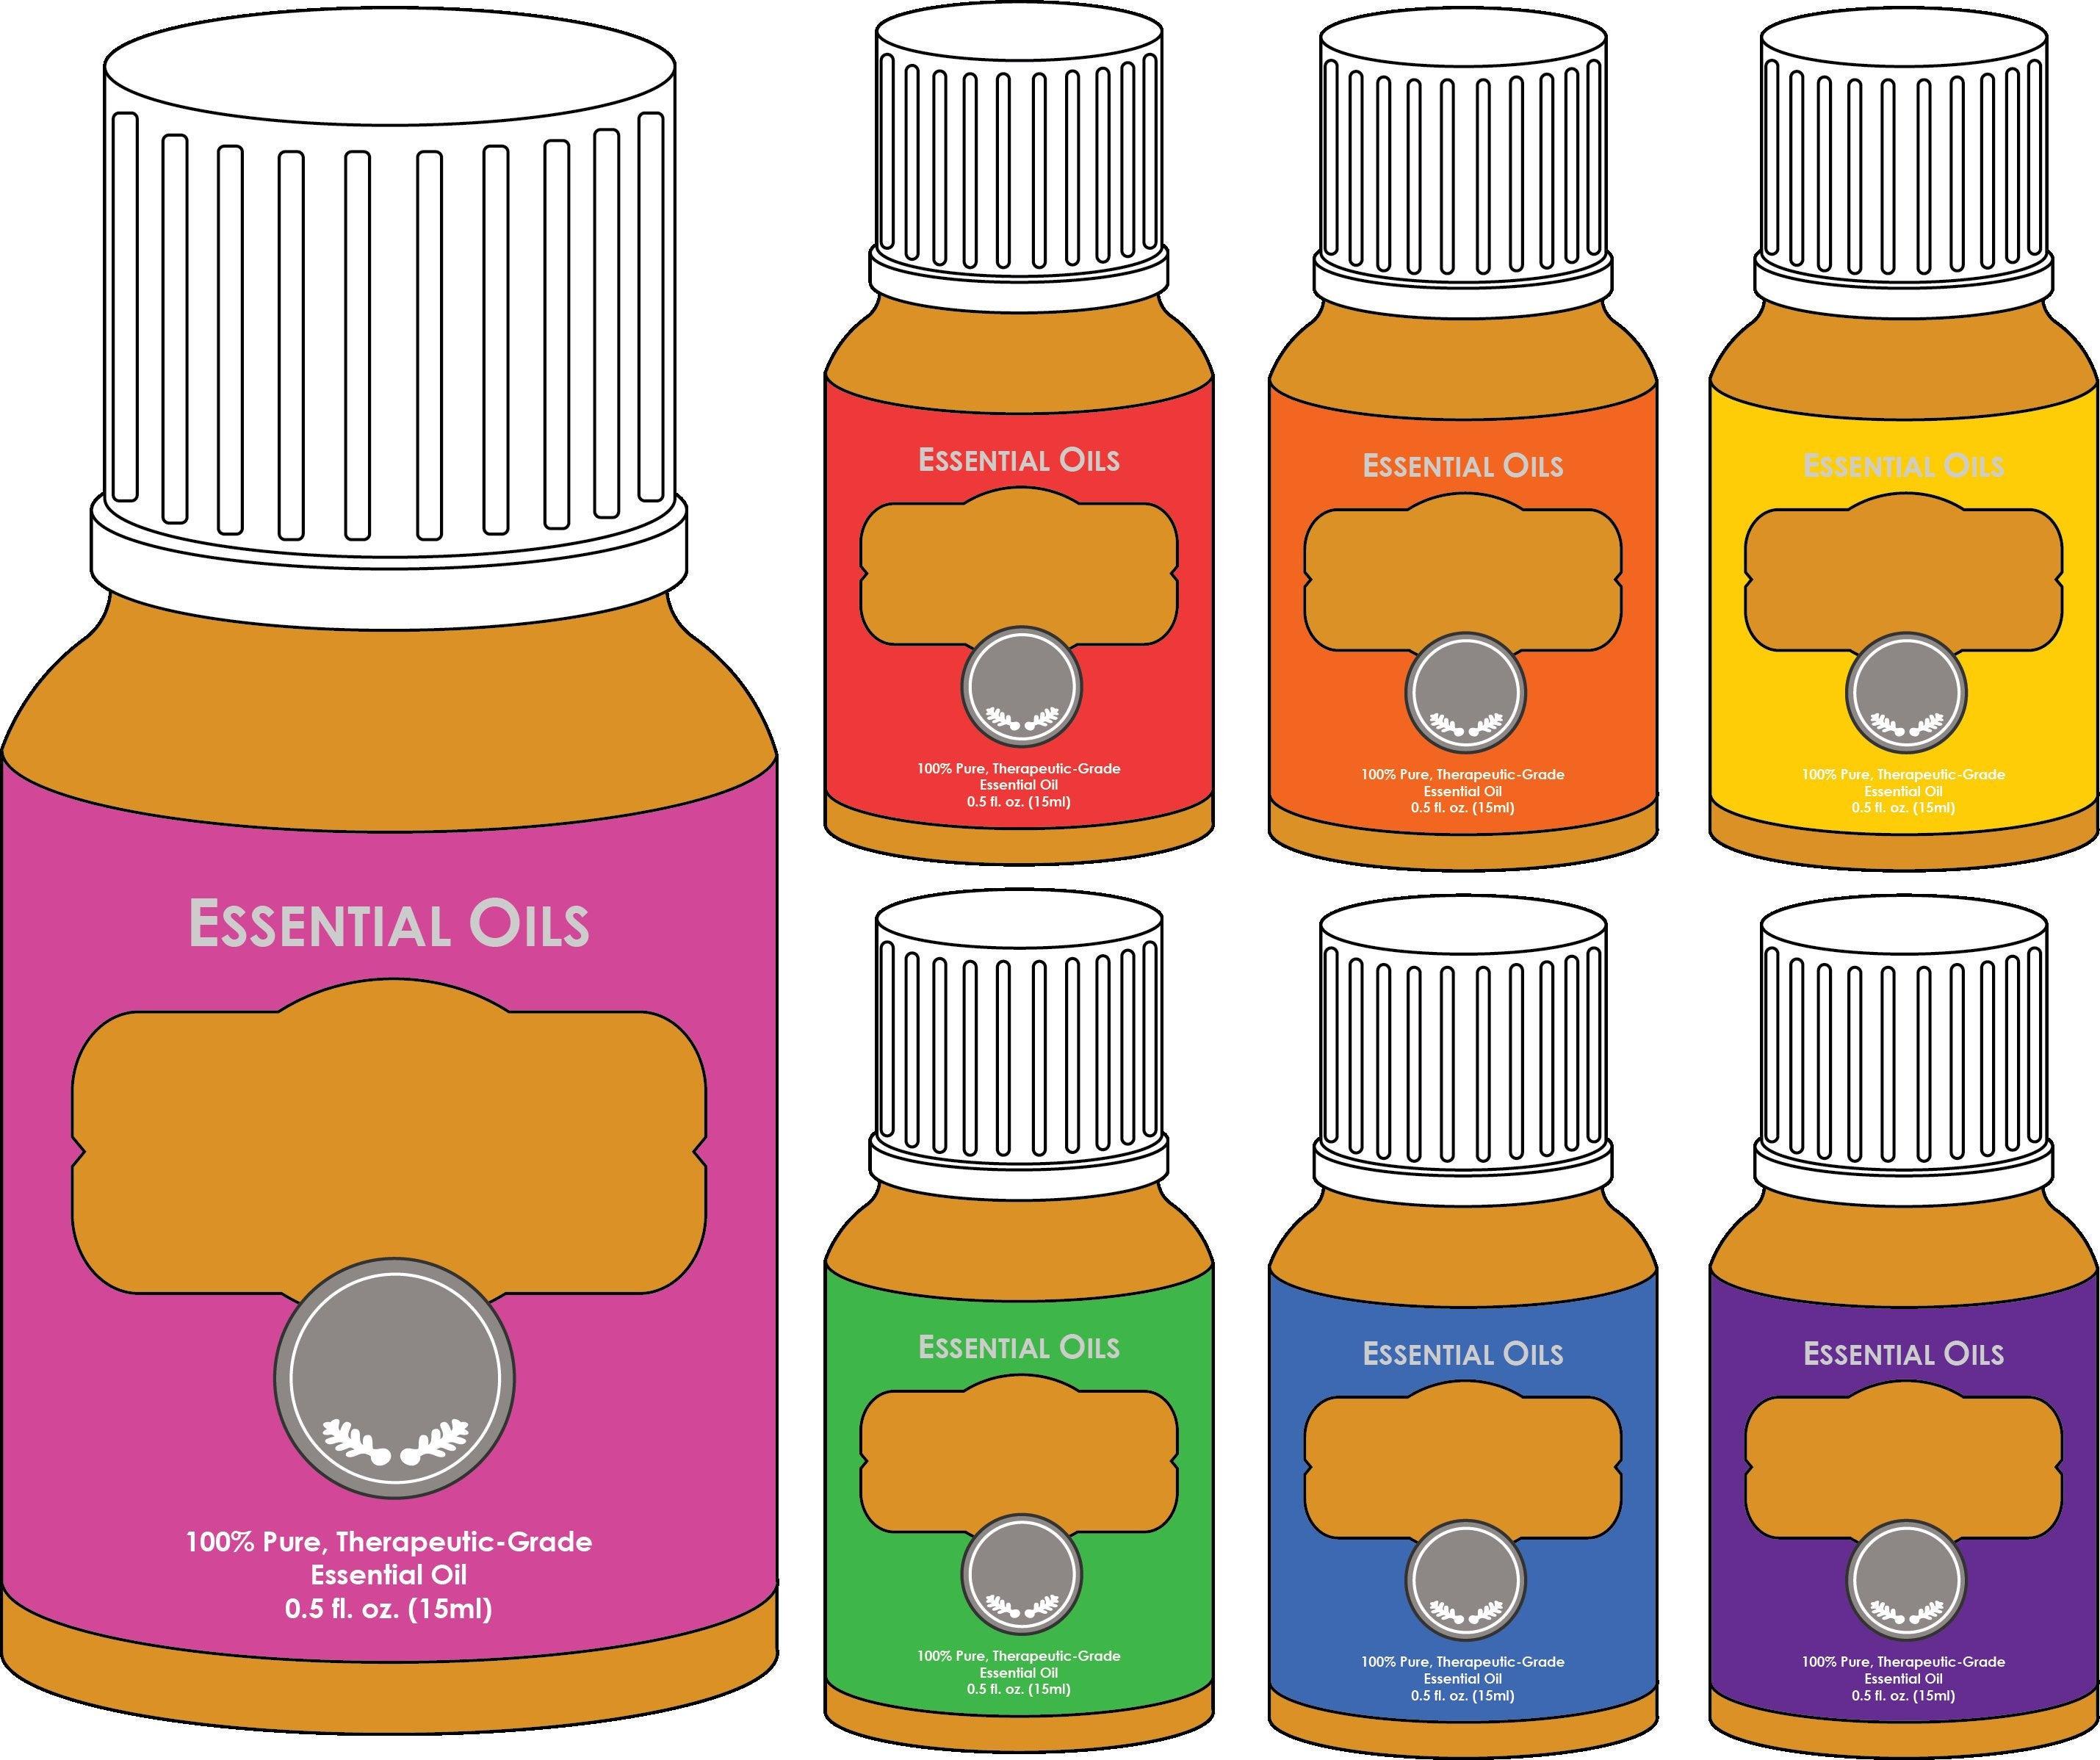 Oil clipart essential oil. Oils bottle svg dpi